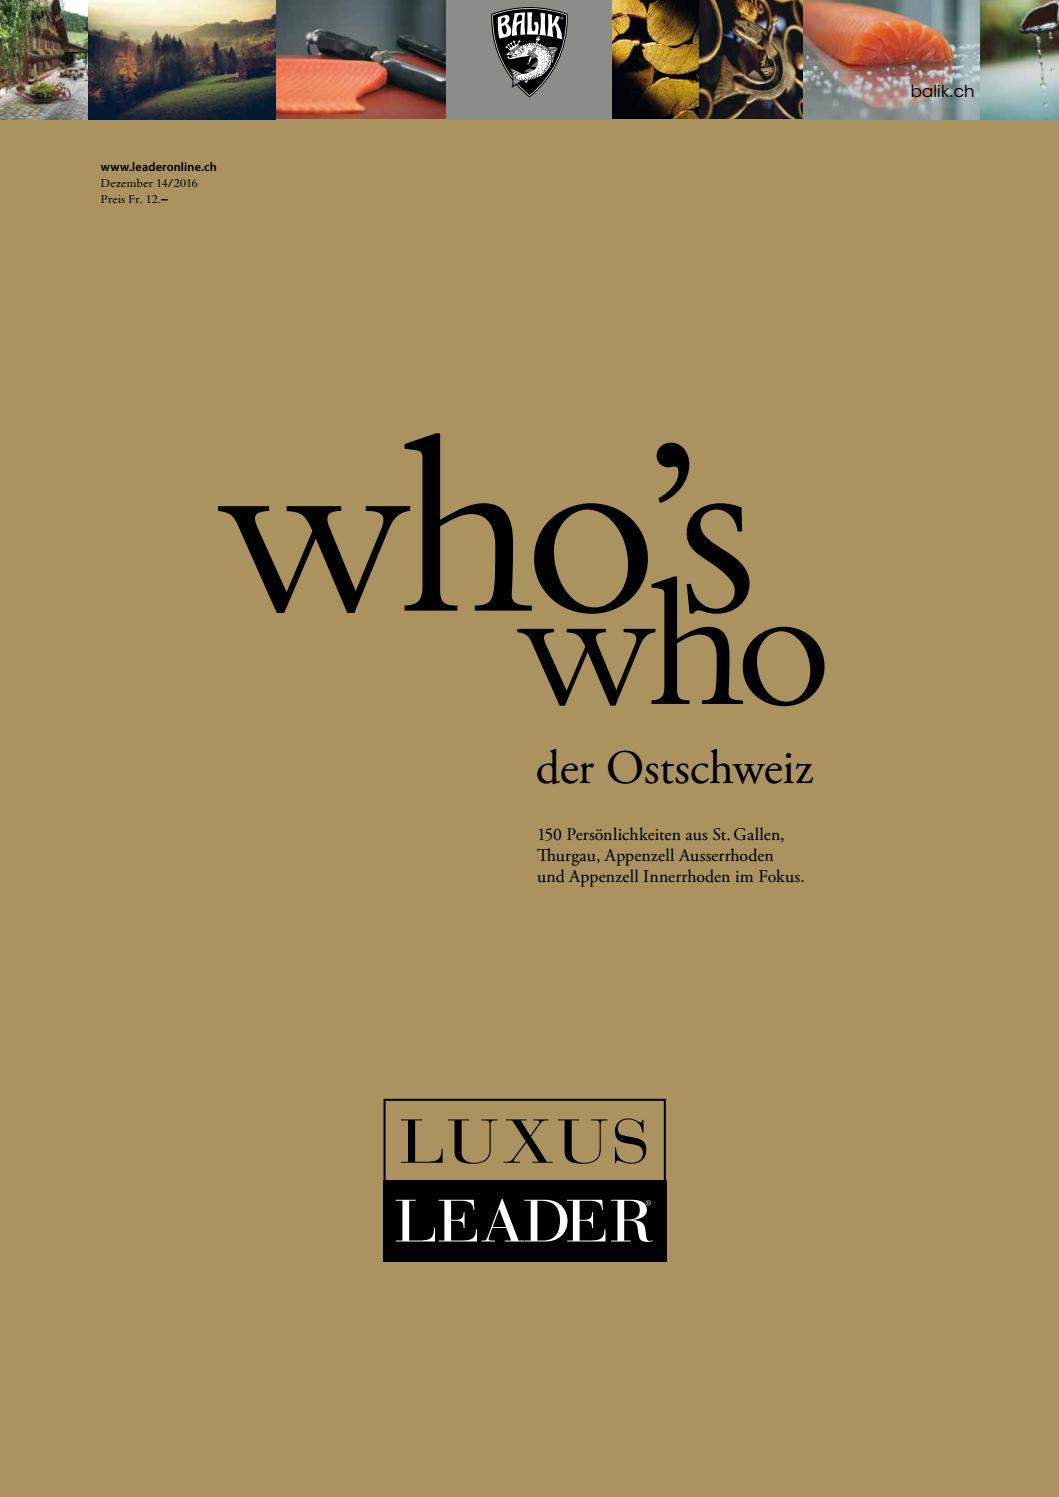 who's who 2016 by LEADER das Unternehmermagazin issuu